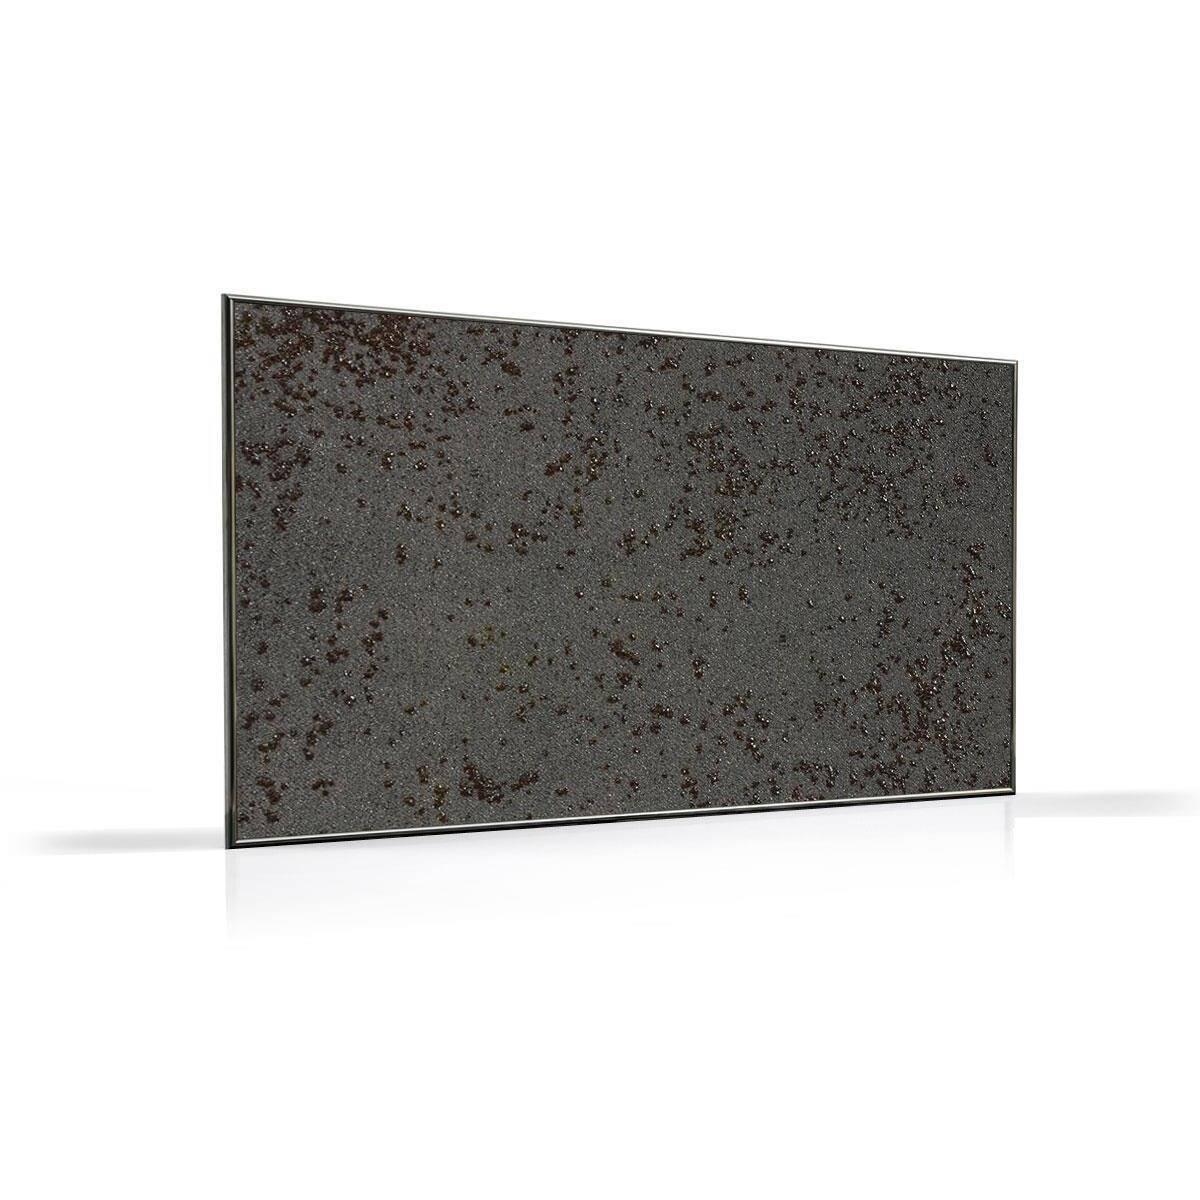 keramik infrarotheizung elbotherm 400 watt iron grey 329 00. Black Bedroom Furniture Sets. Home Design Ideas